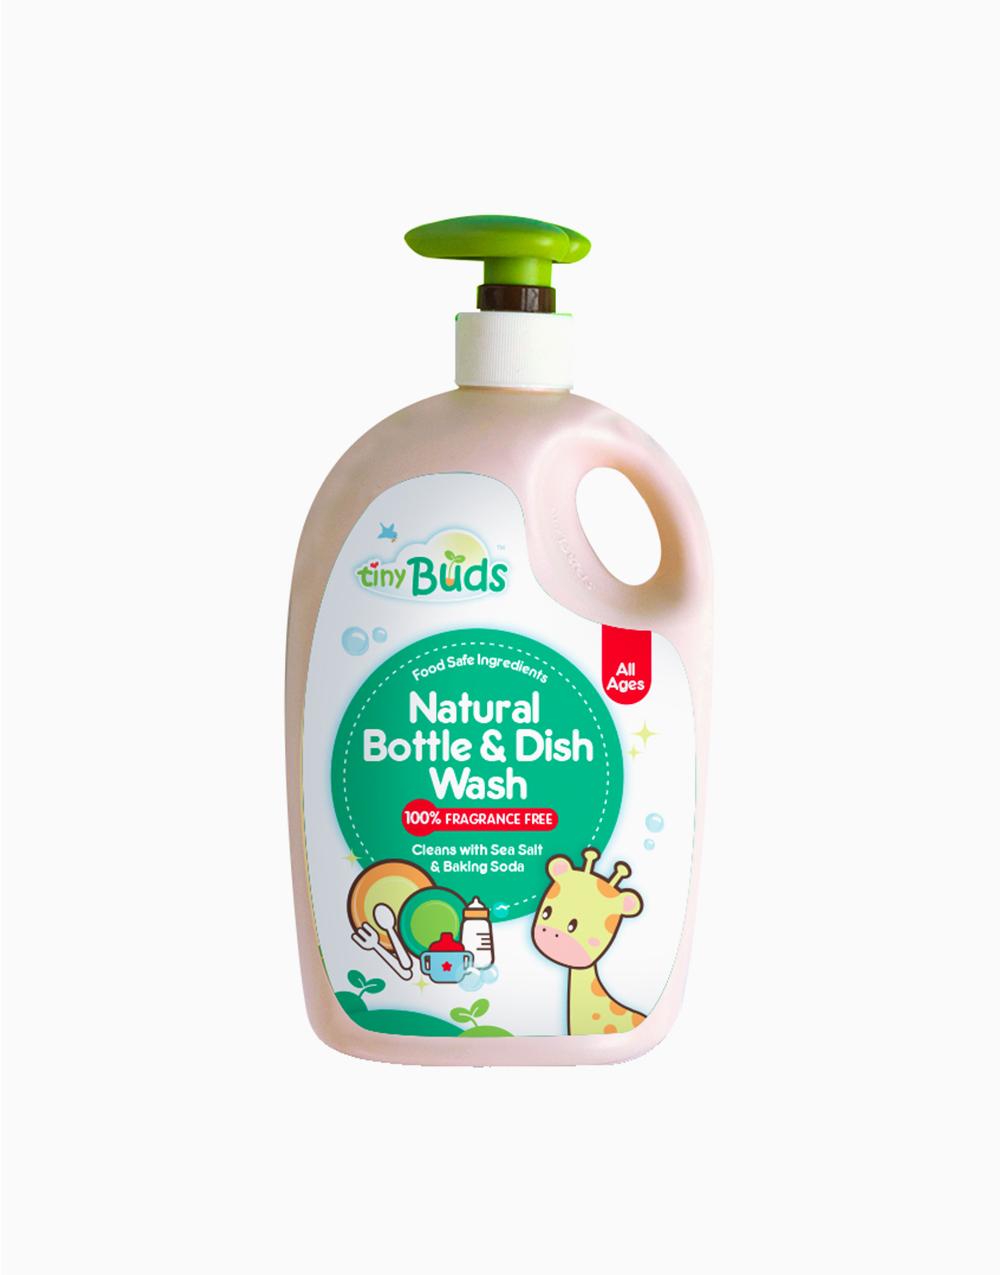 Dish & Bottle Wash Bottle (600ml) by Tiny Buds